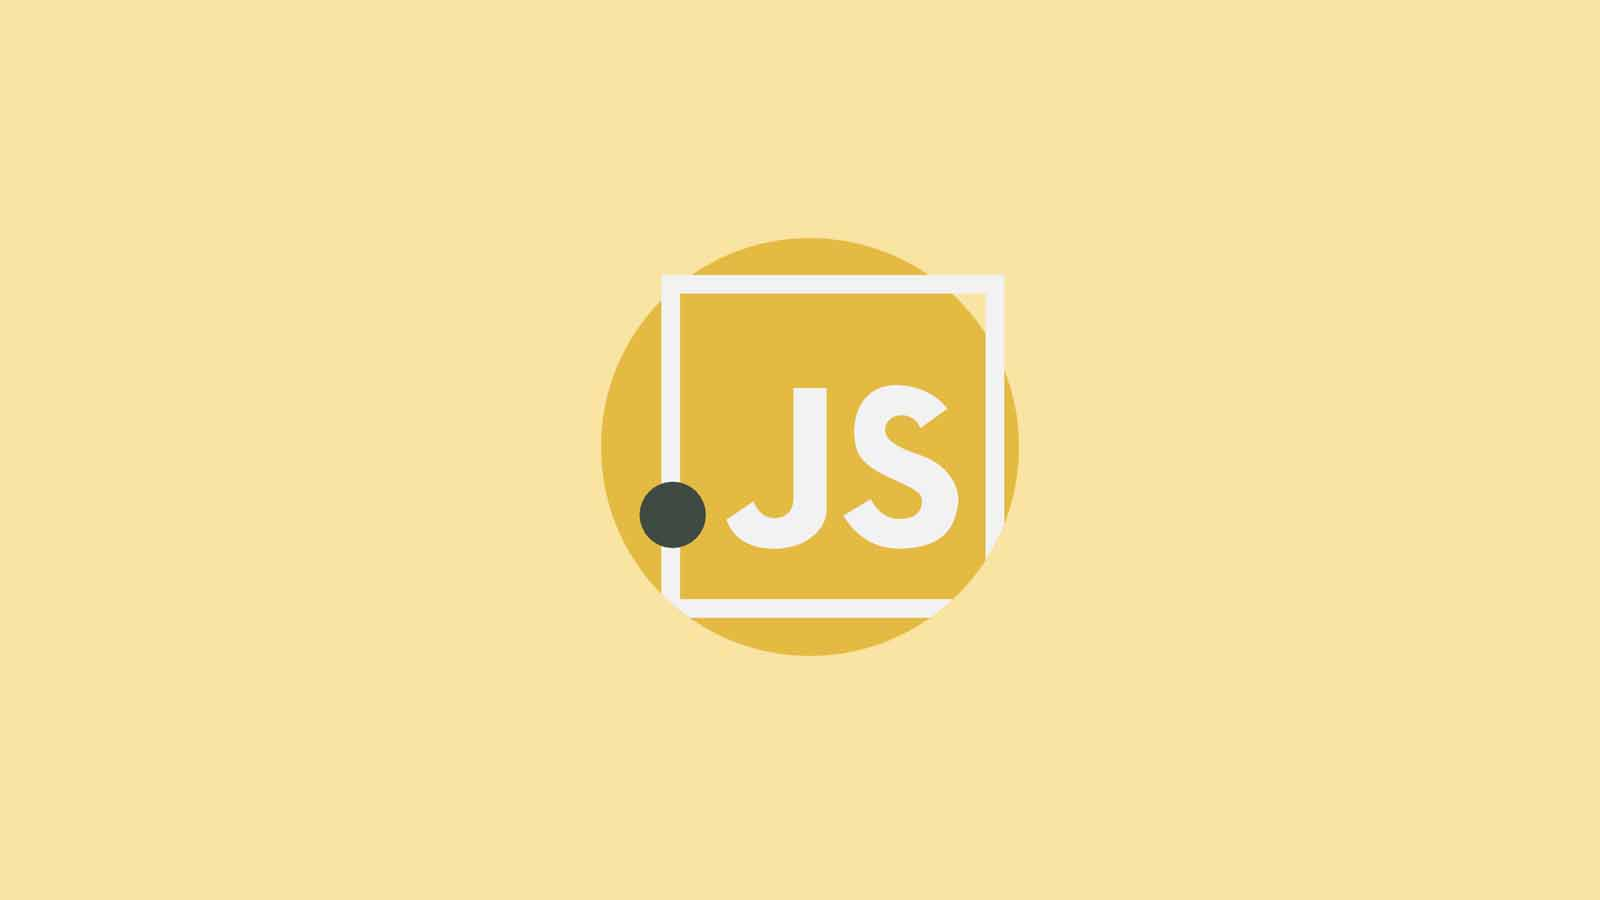 Daftar Isi - JavaScript